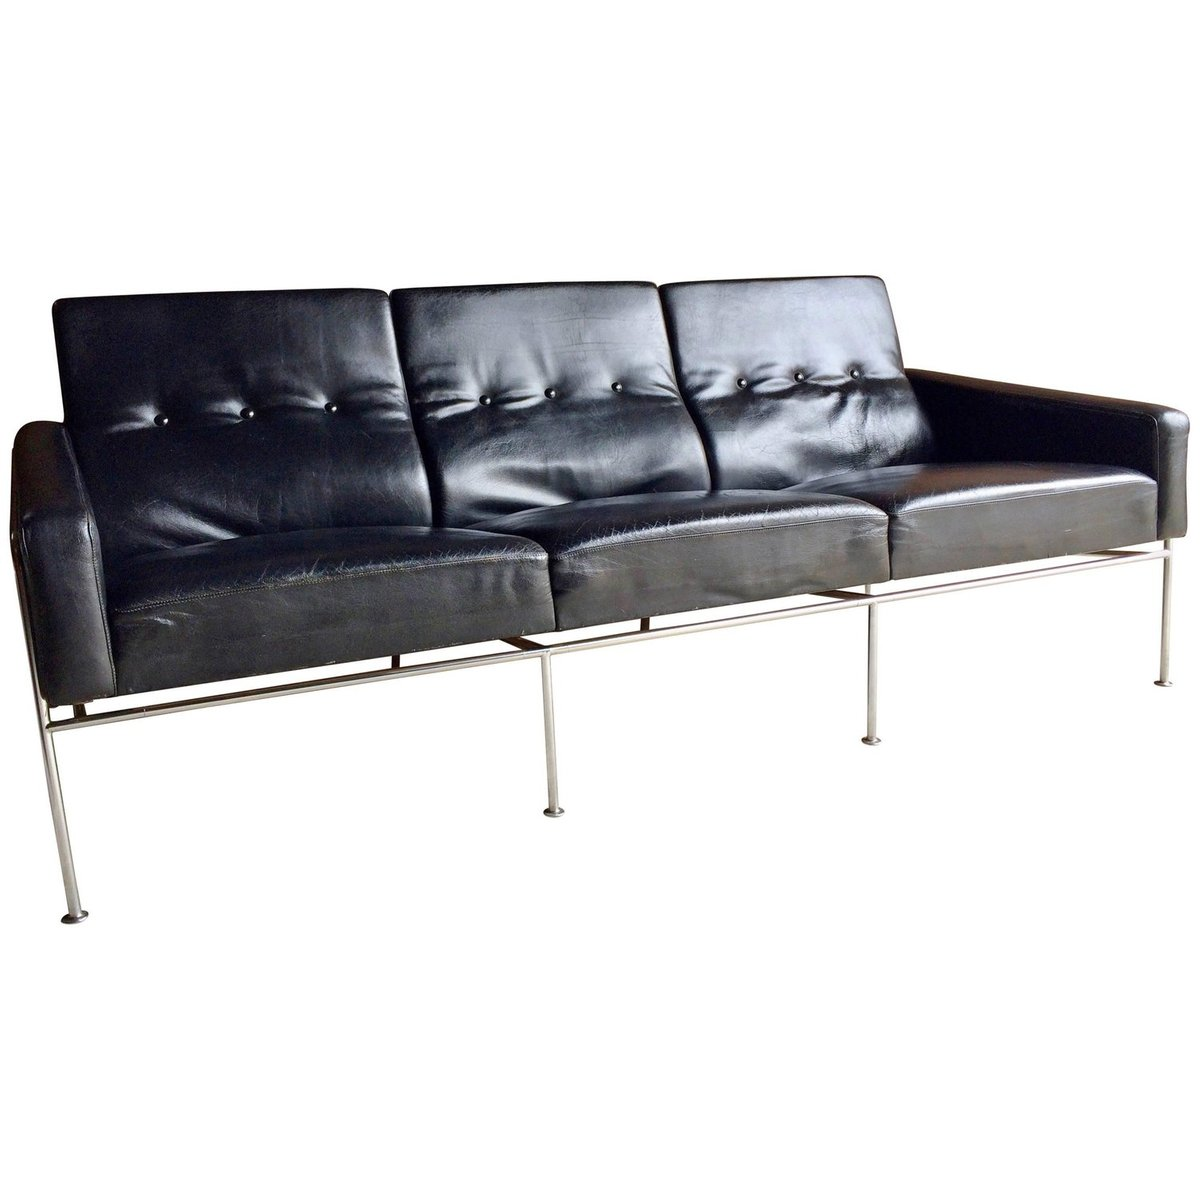 3 seater sofa black leather custom sofas seattle wa 3300 three in by arne jacobsen